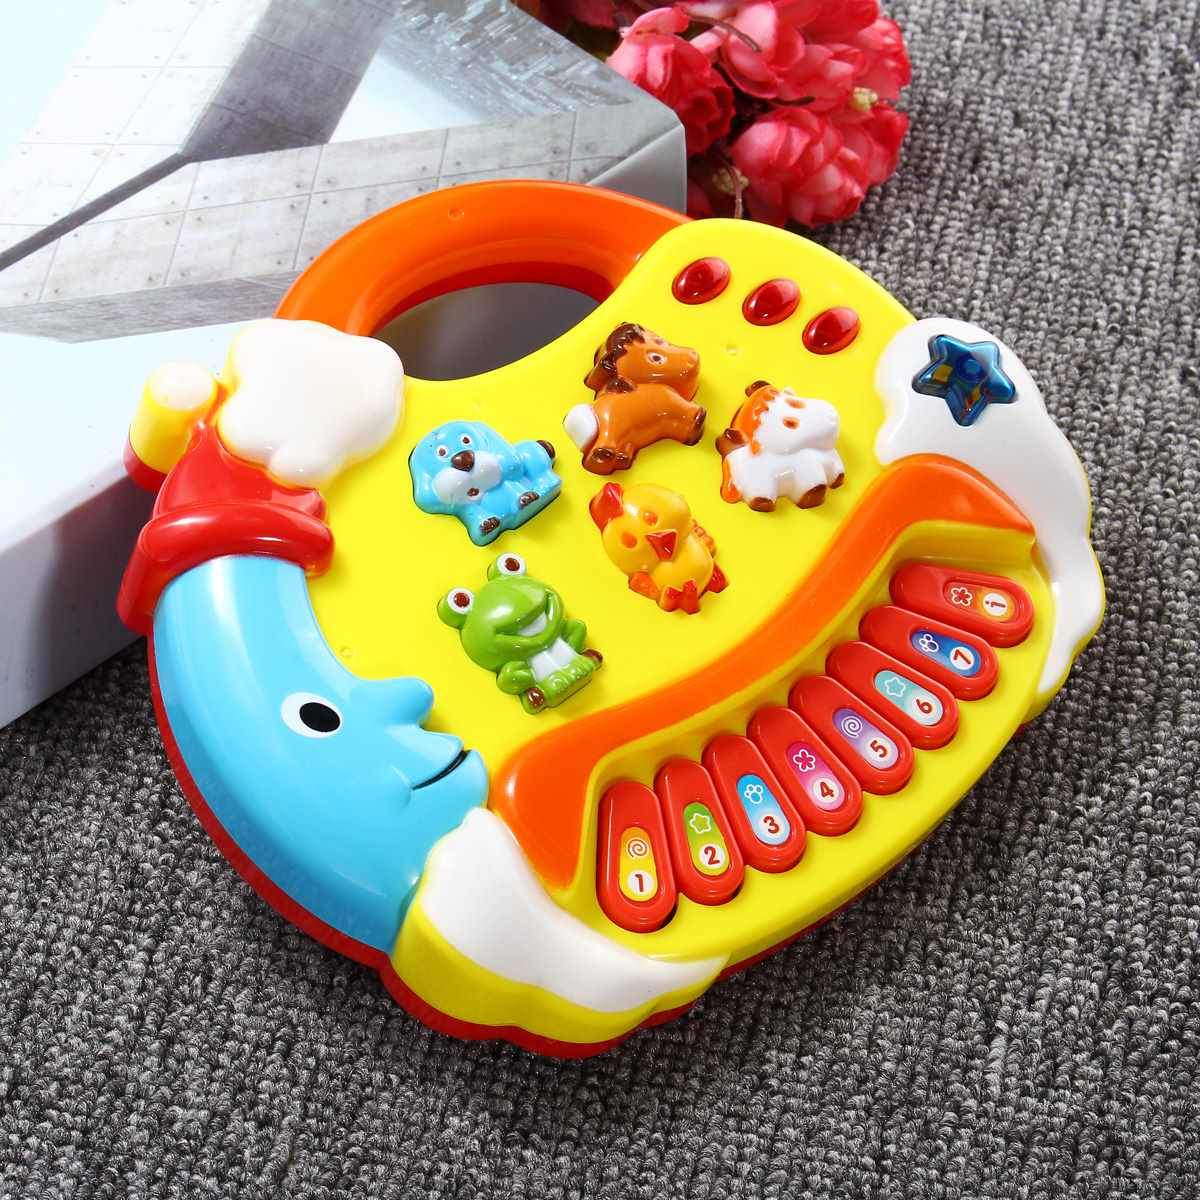 Funny-Lovely-Baby-Children-Kids-Musical-Educational-Animal-Farm-Piano-Toys-Developmental-Music-Toy-For-Children-1